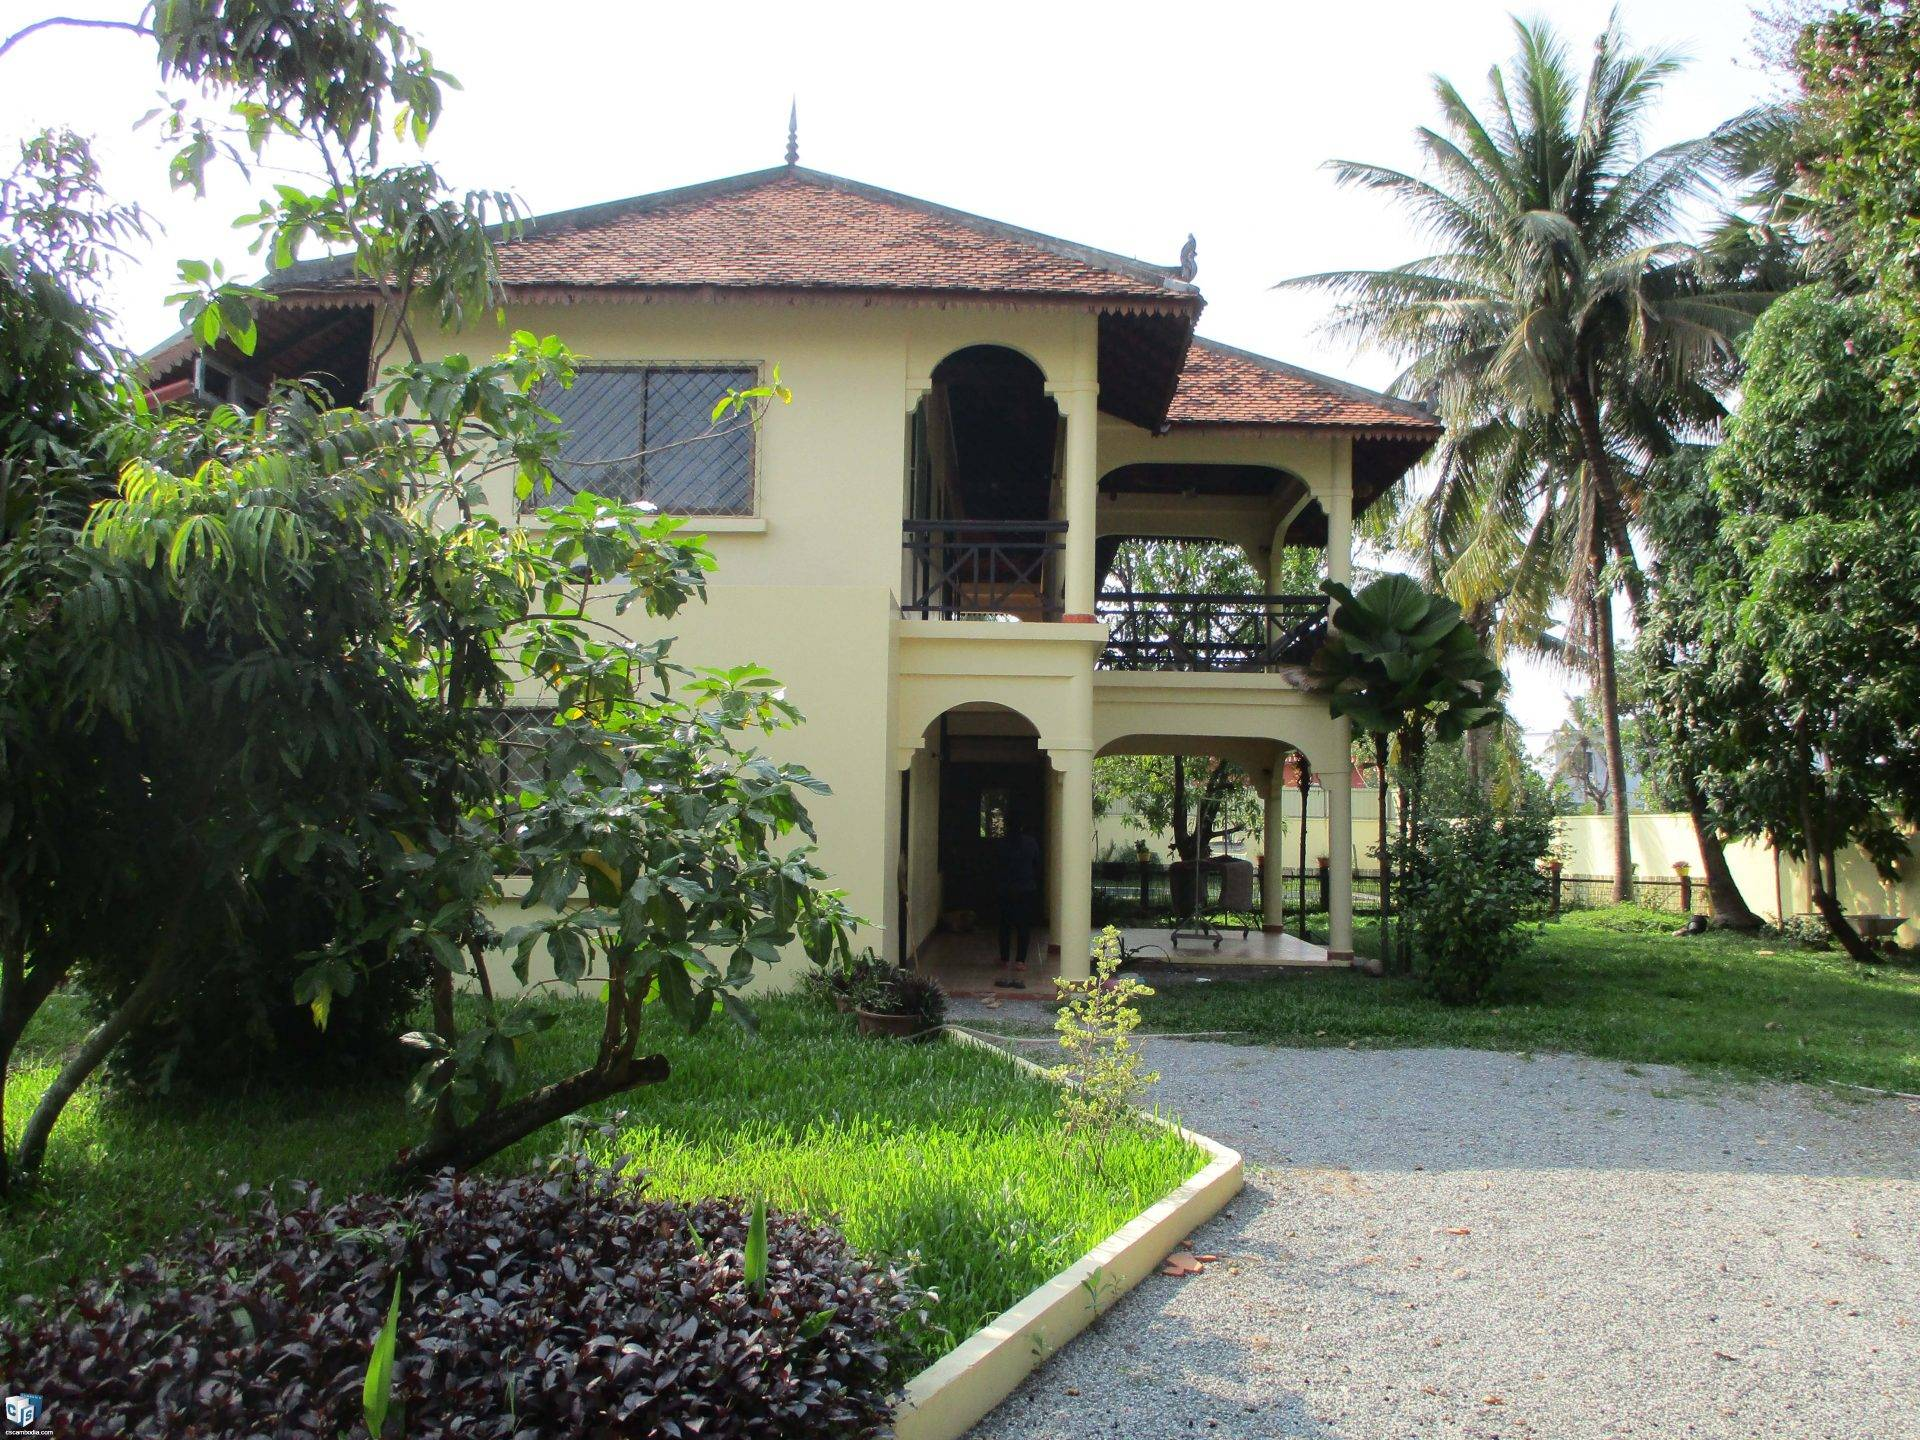 3 Bedroom House – For Sale – Svay Dangkum Commune – Siem Reap